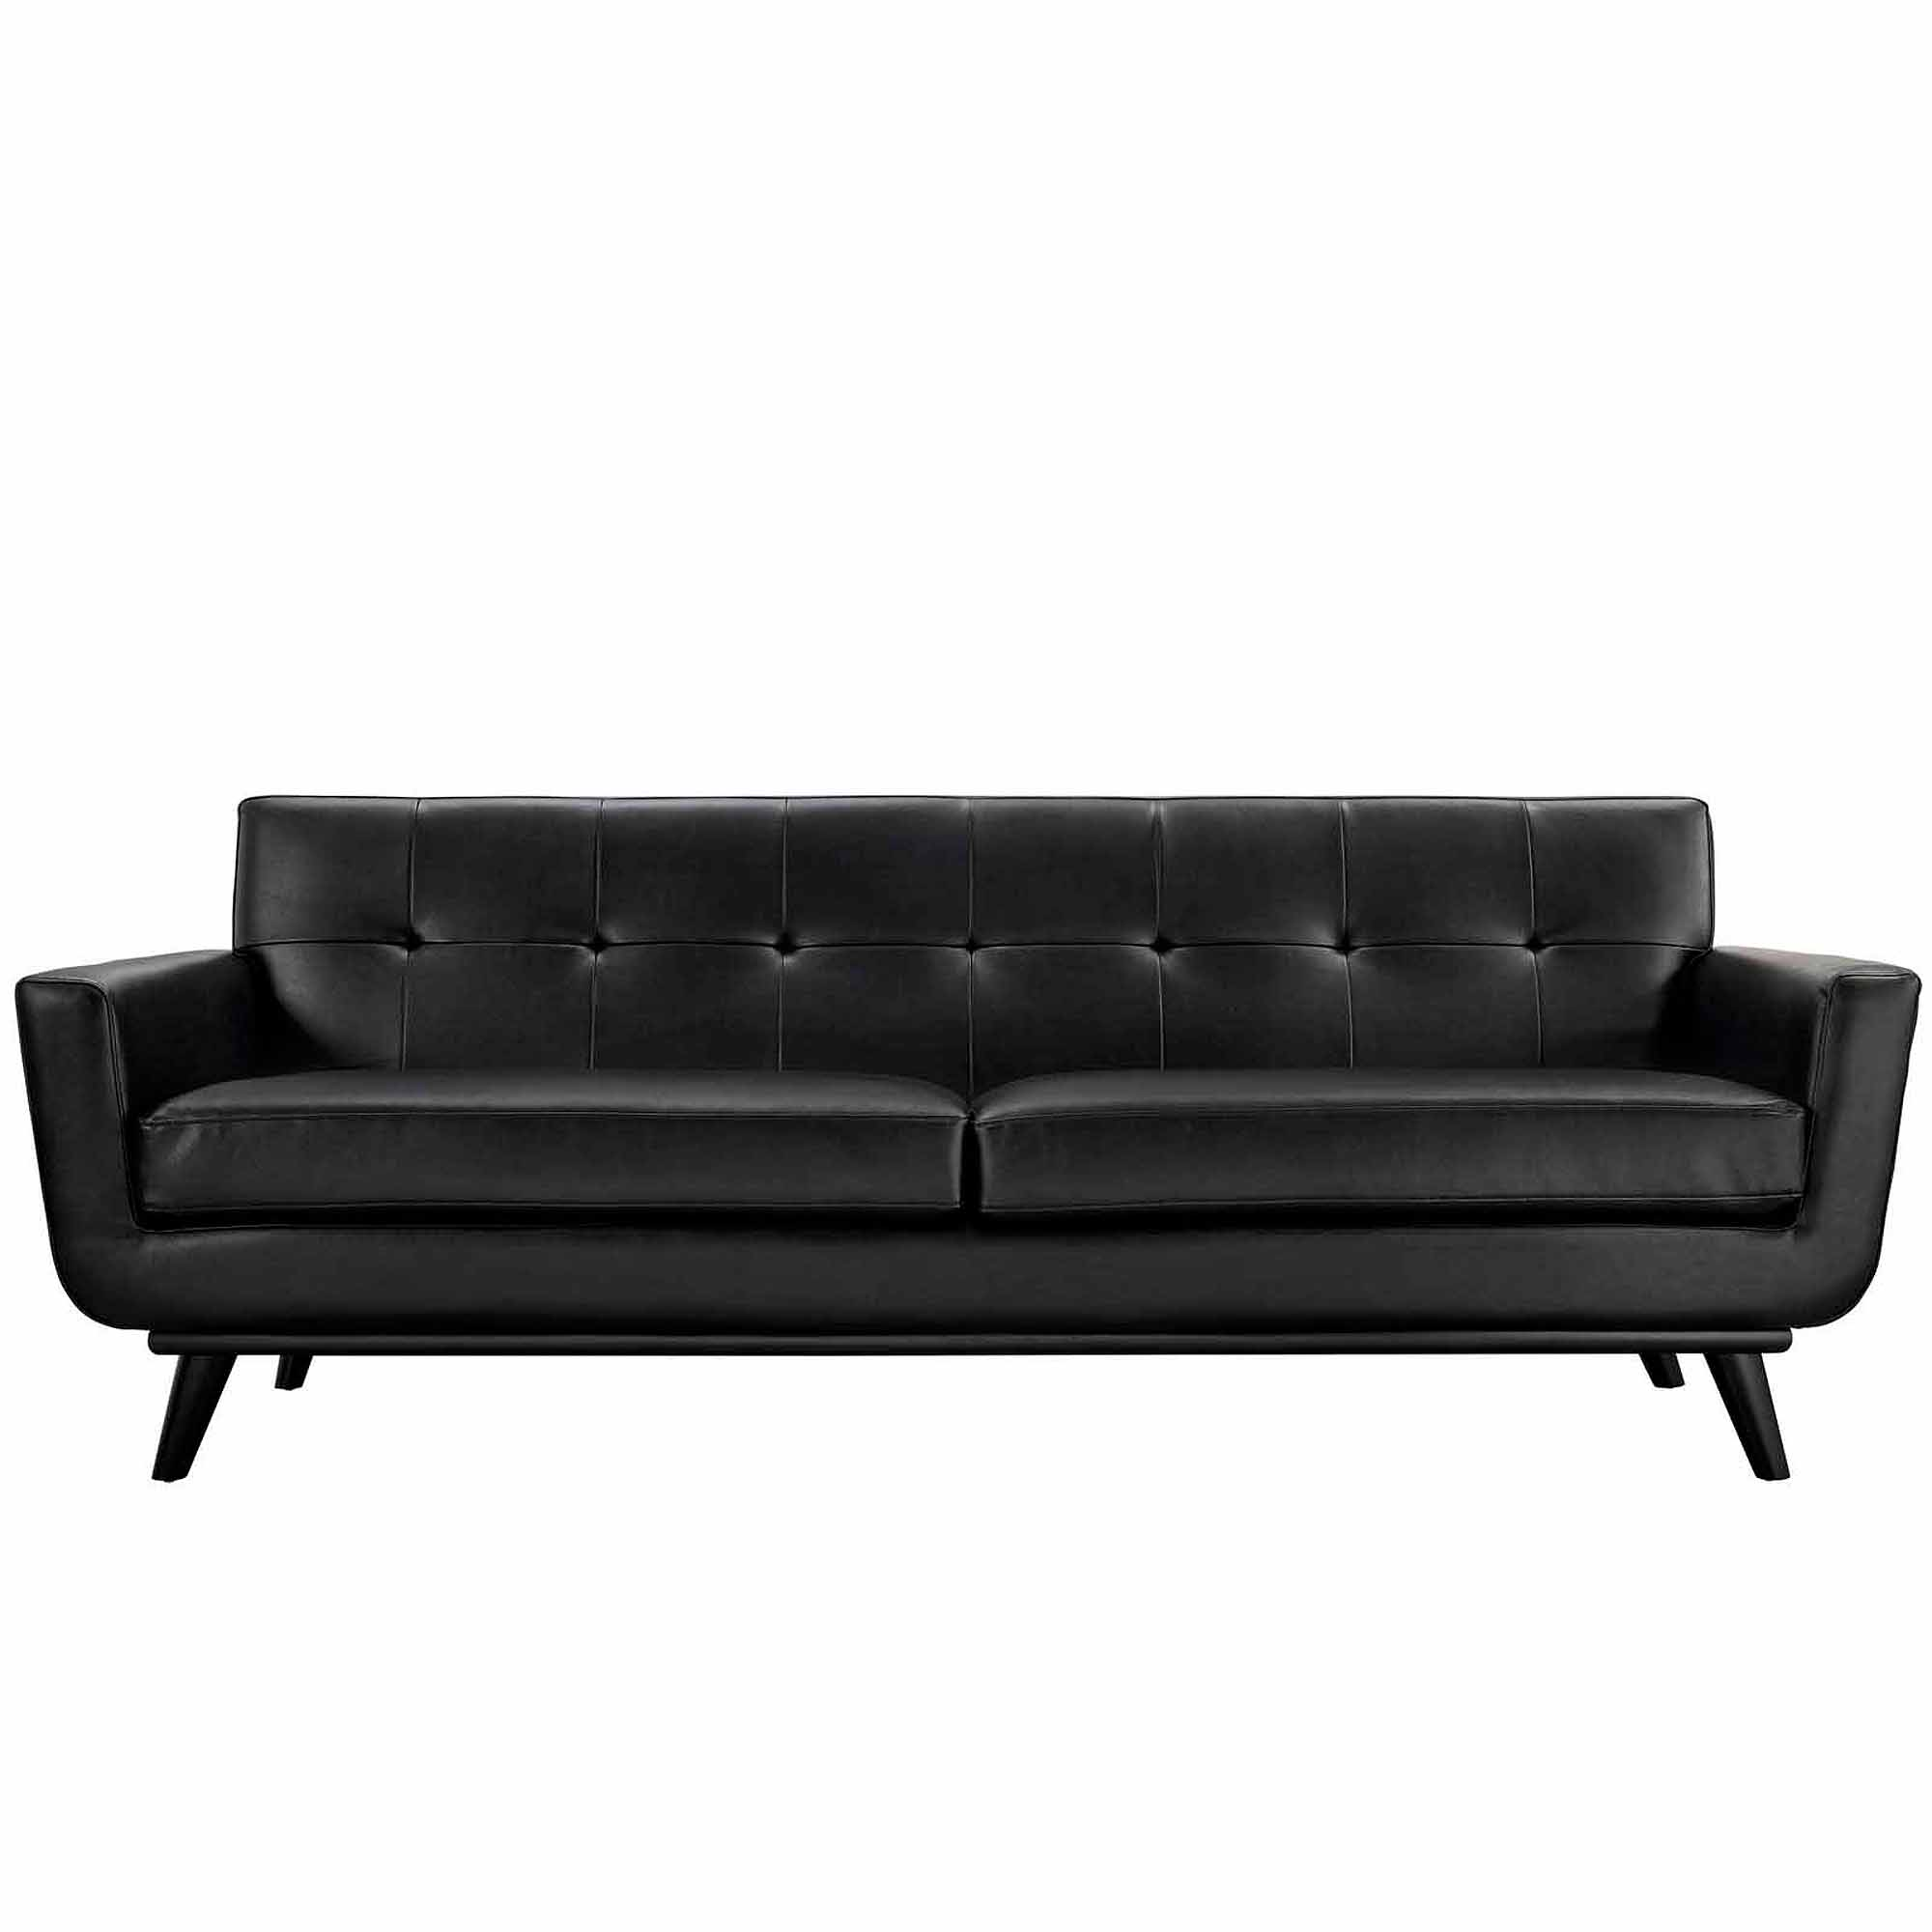 delta sofa debenhams multiyork manhattan reviews modway engage bonded leather with wood legs multiple colors walmart com